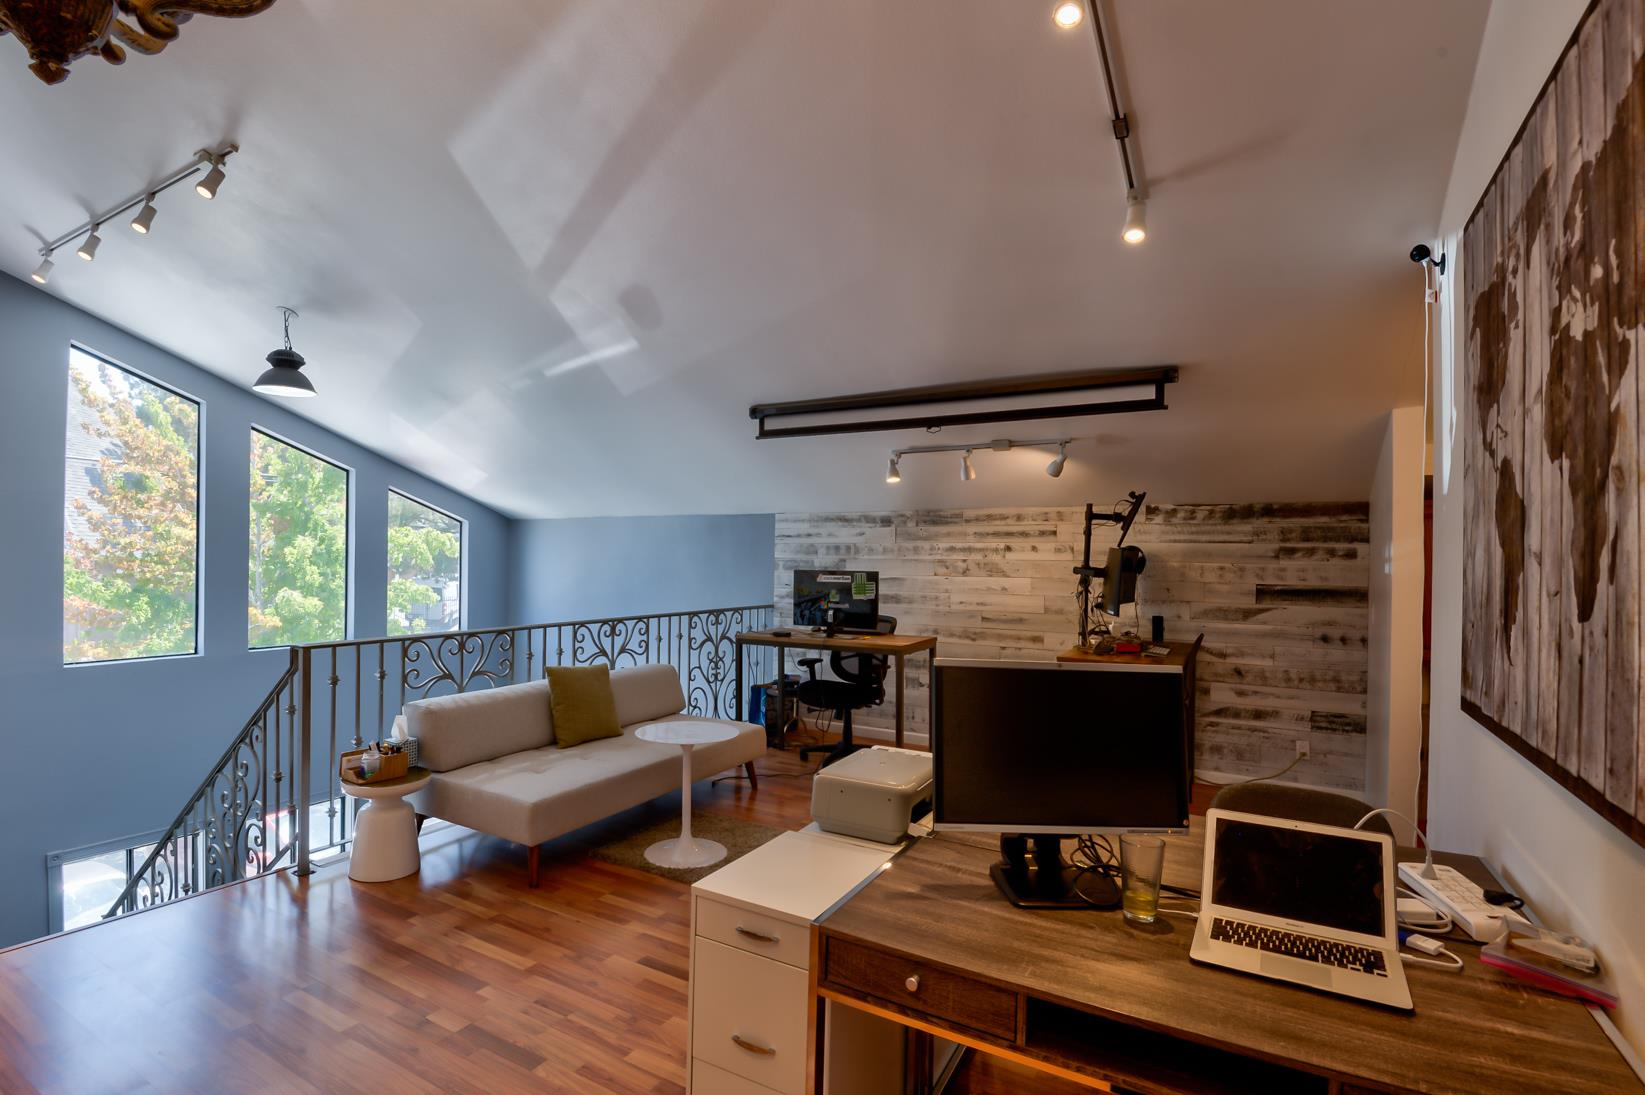 OnePiece SJ - Dedicated Desk